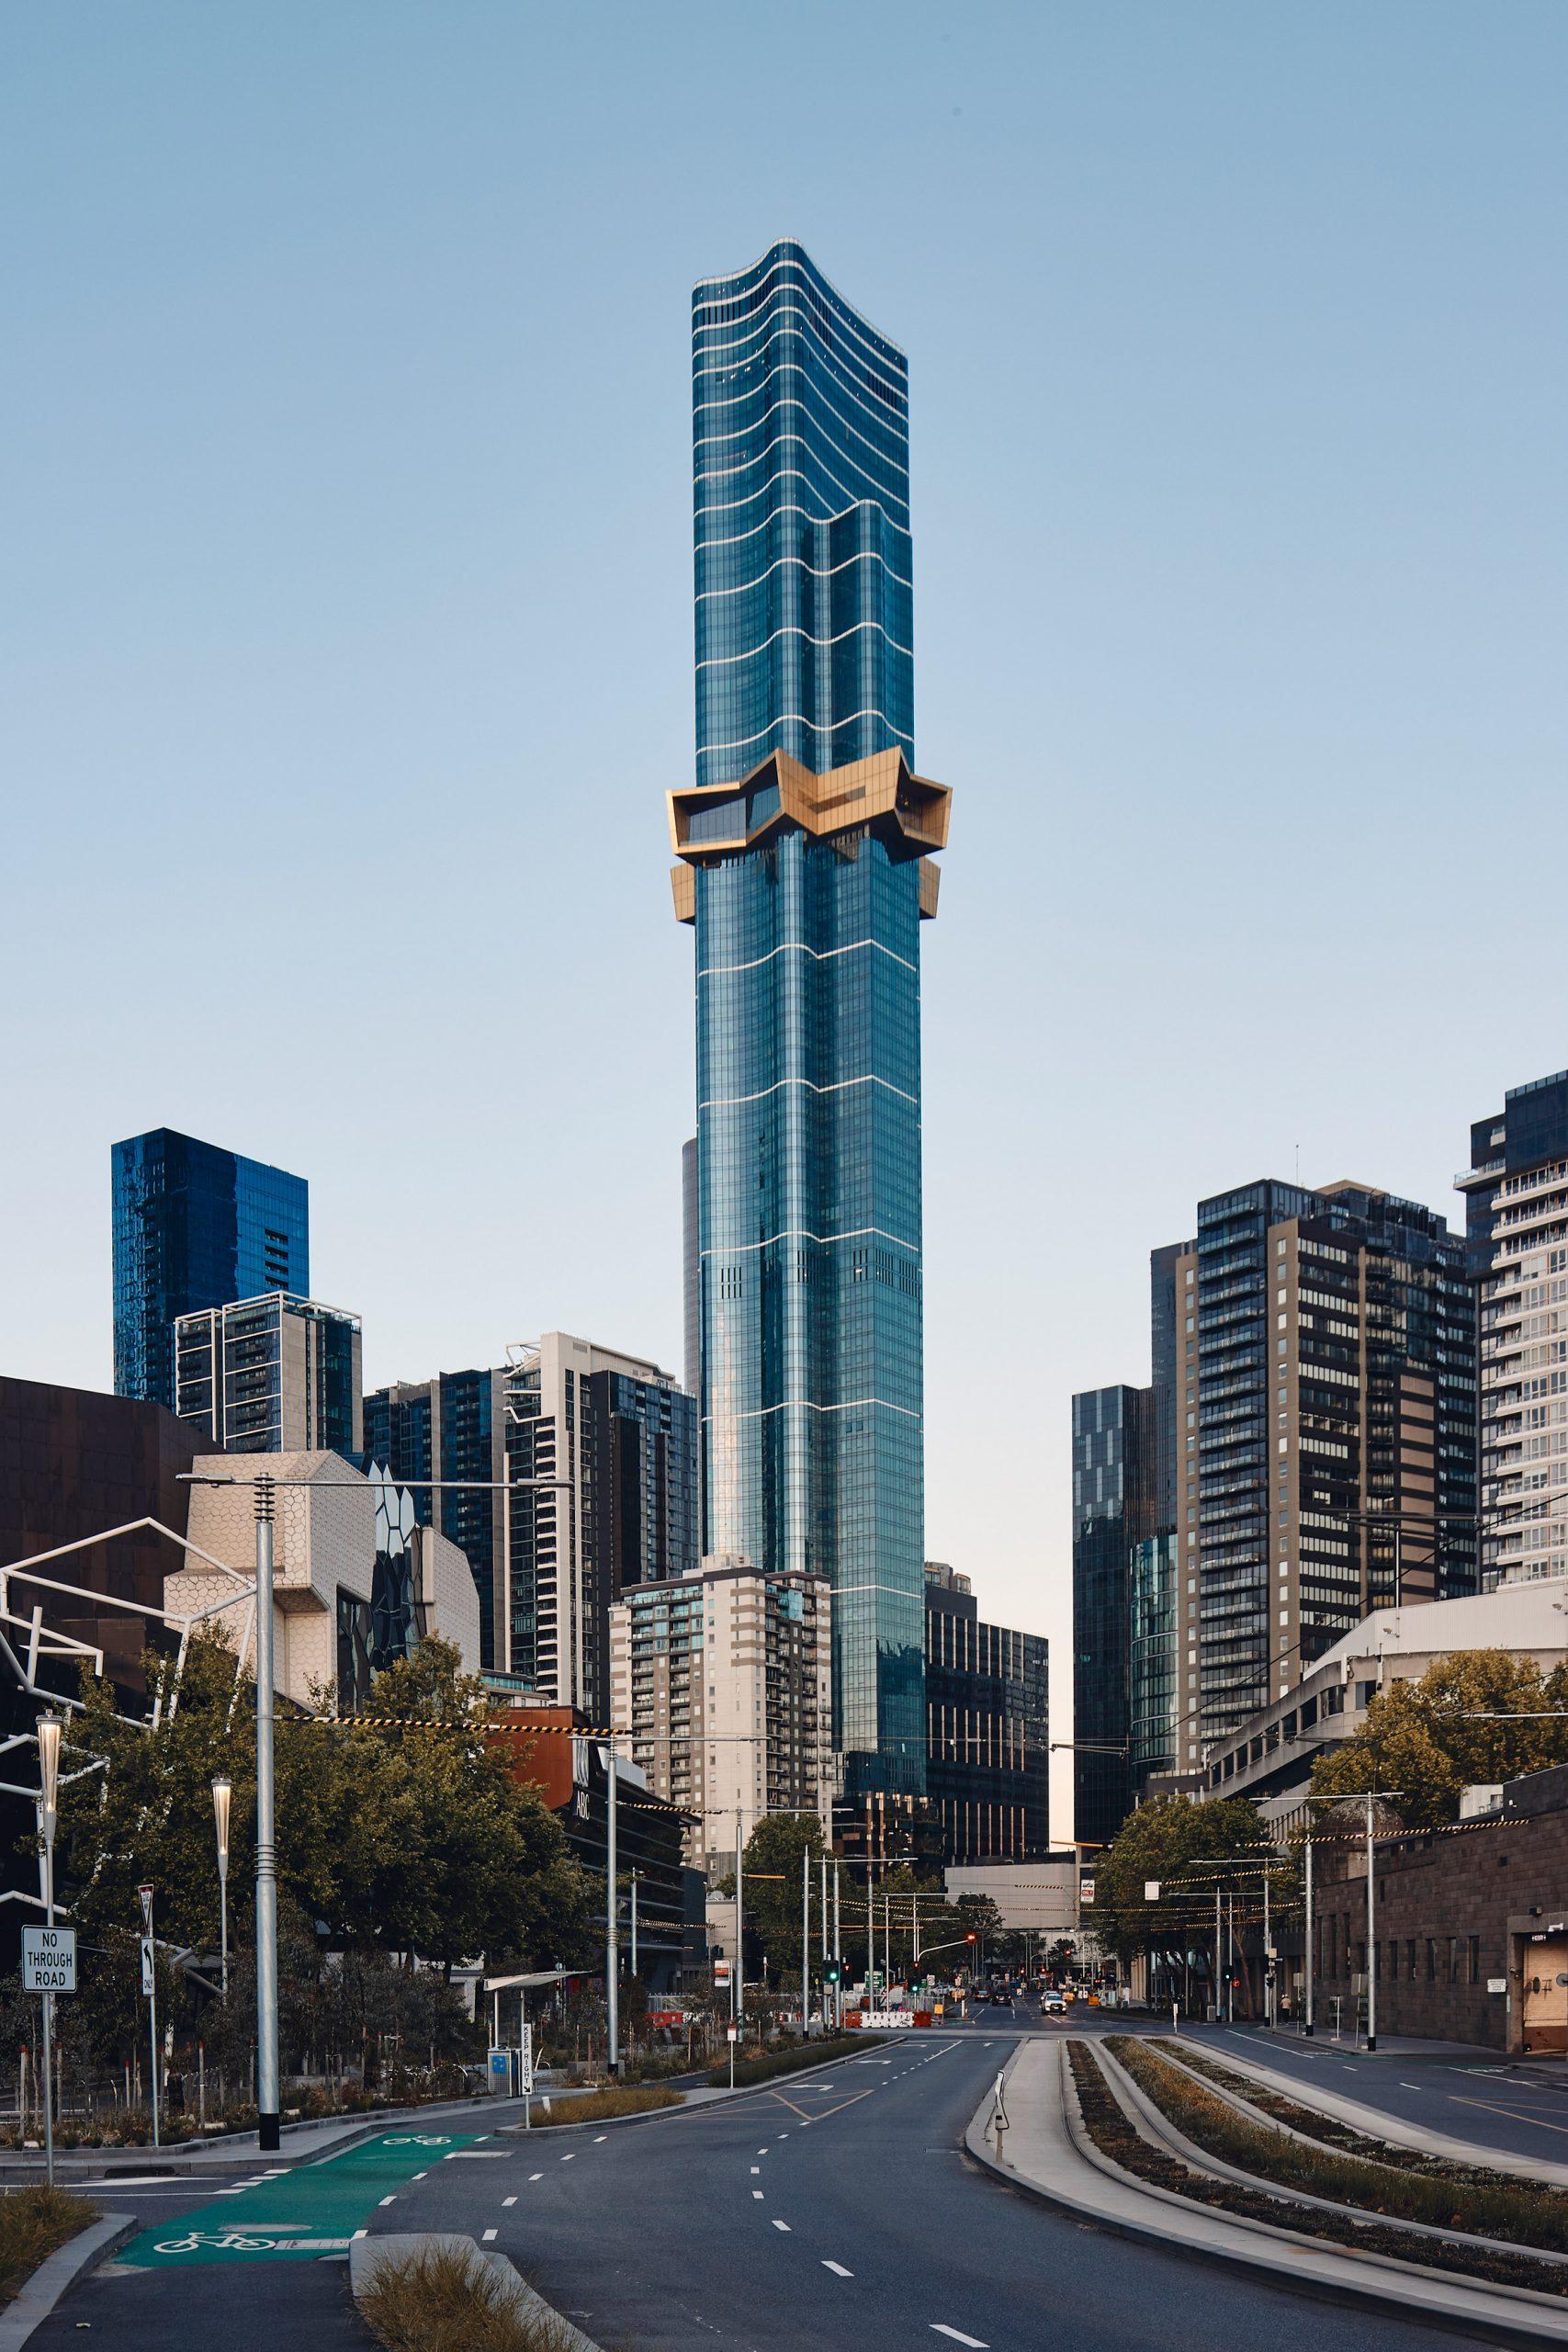 Australia 108 in Melbourne